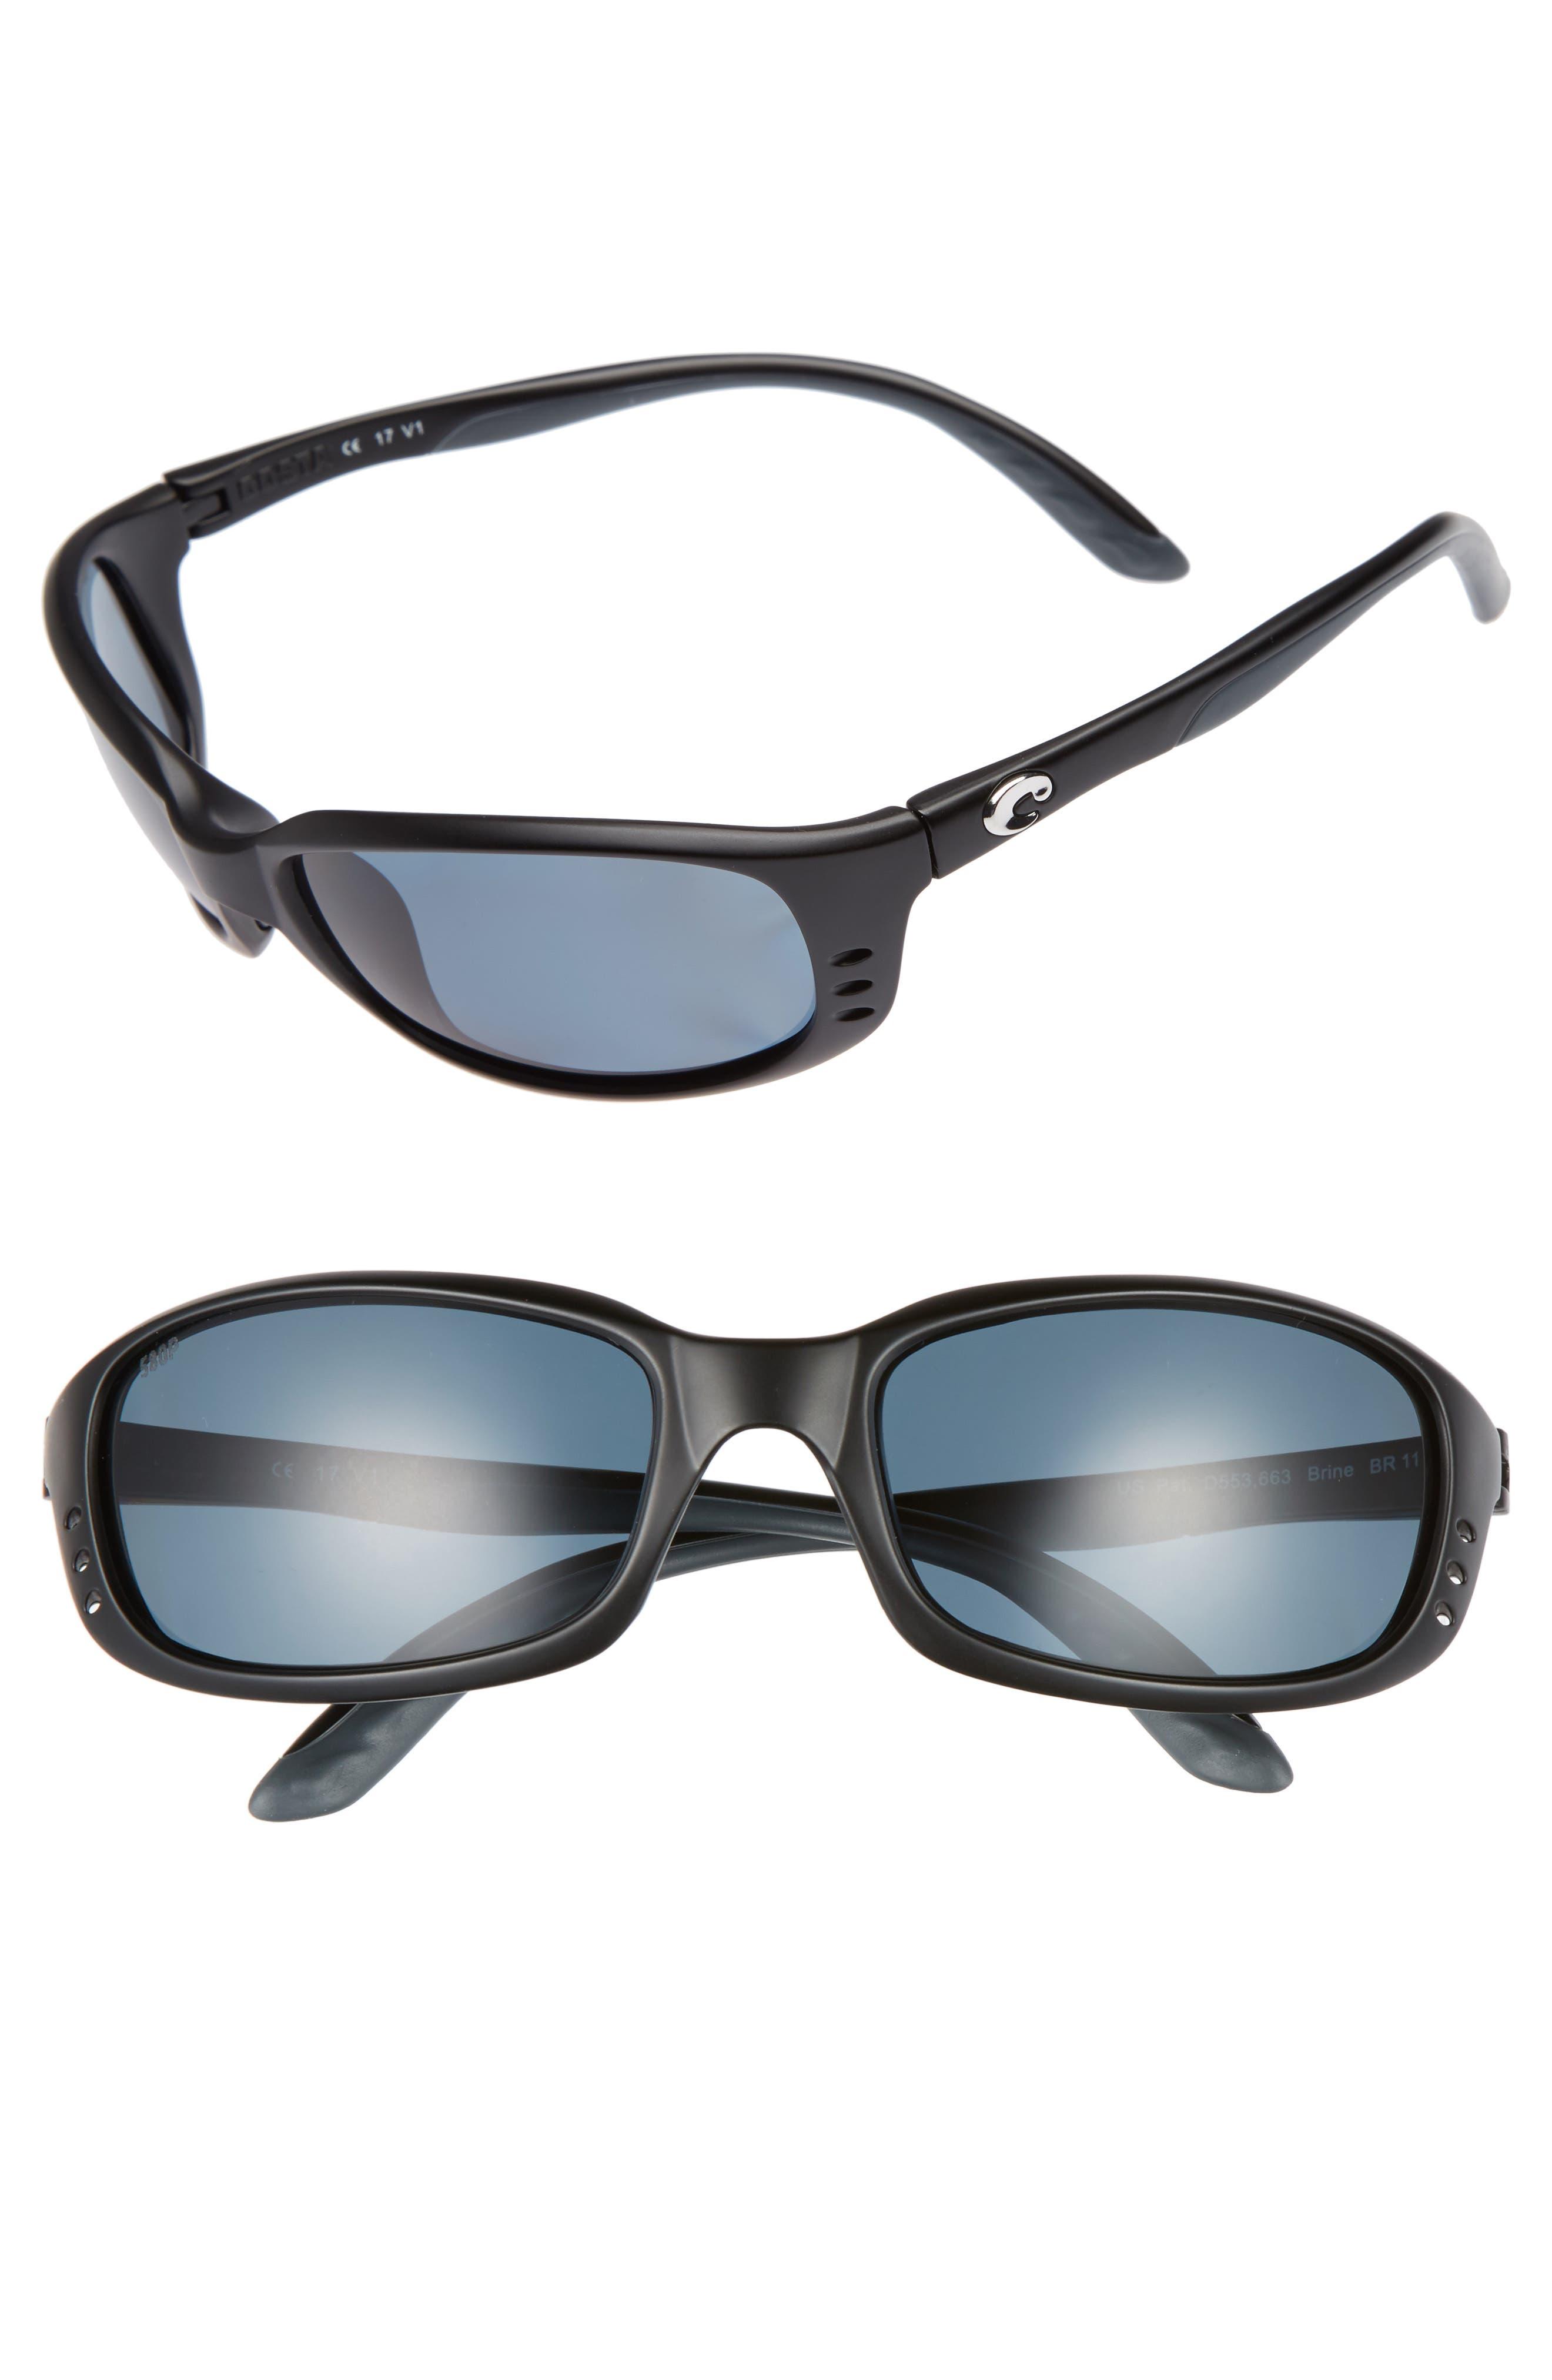 Brine Polarized 60mm Sunglasses,                             Main thumbnail 1, color,                             Matte Black/ Grey